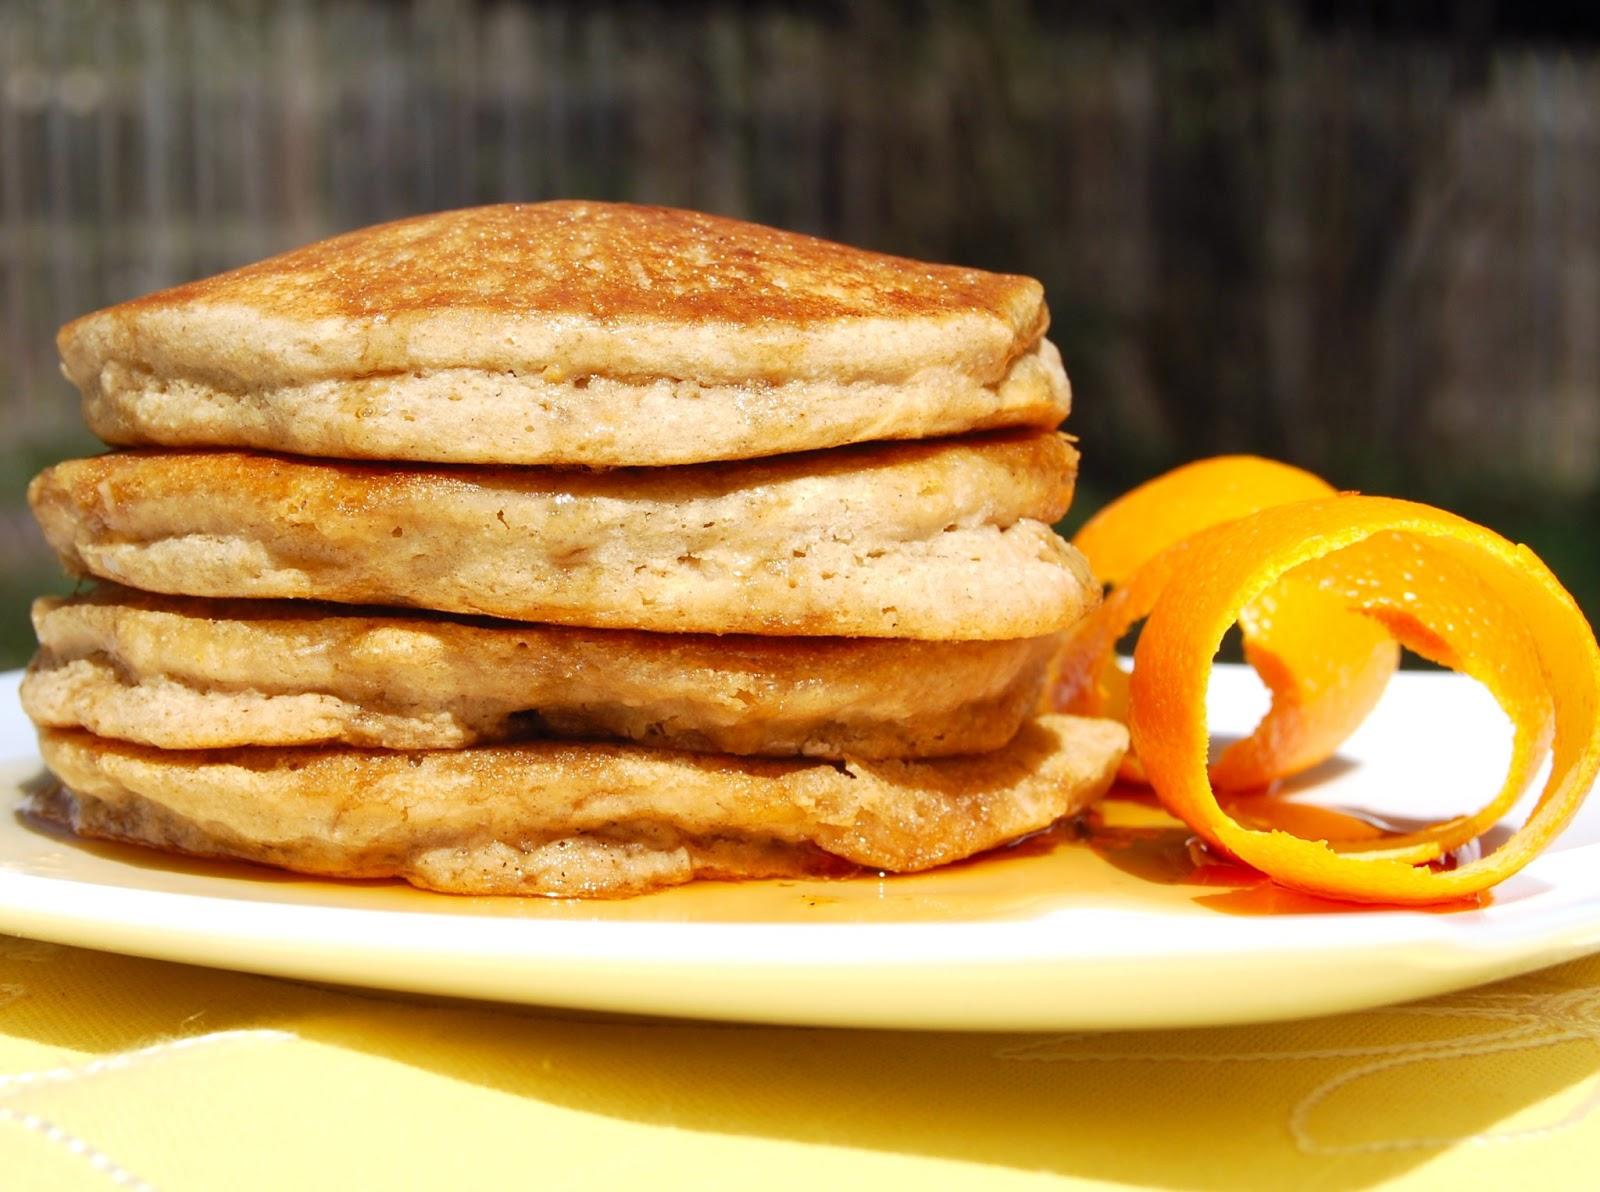 Vegan American pancakes with cassava flour